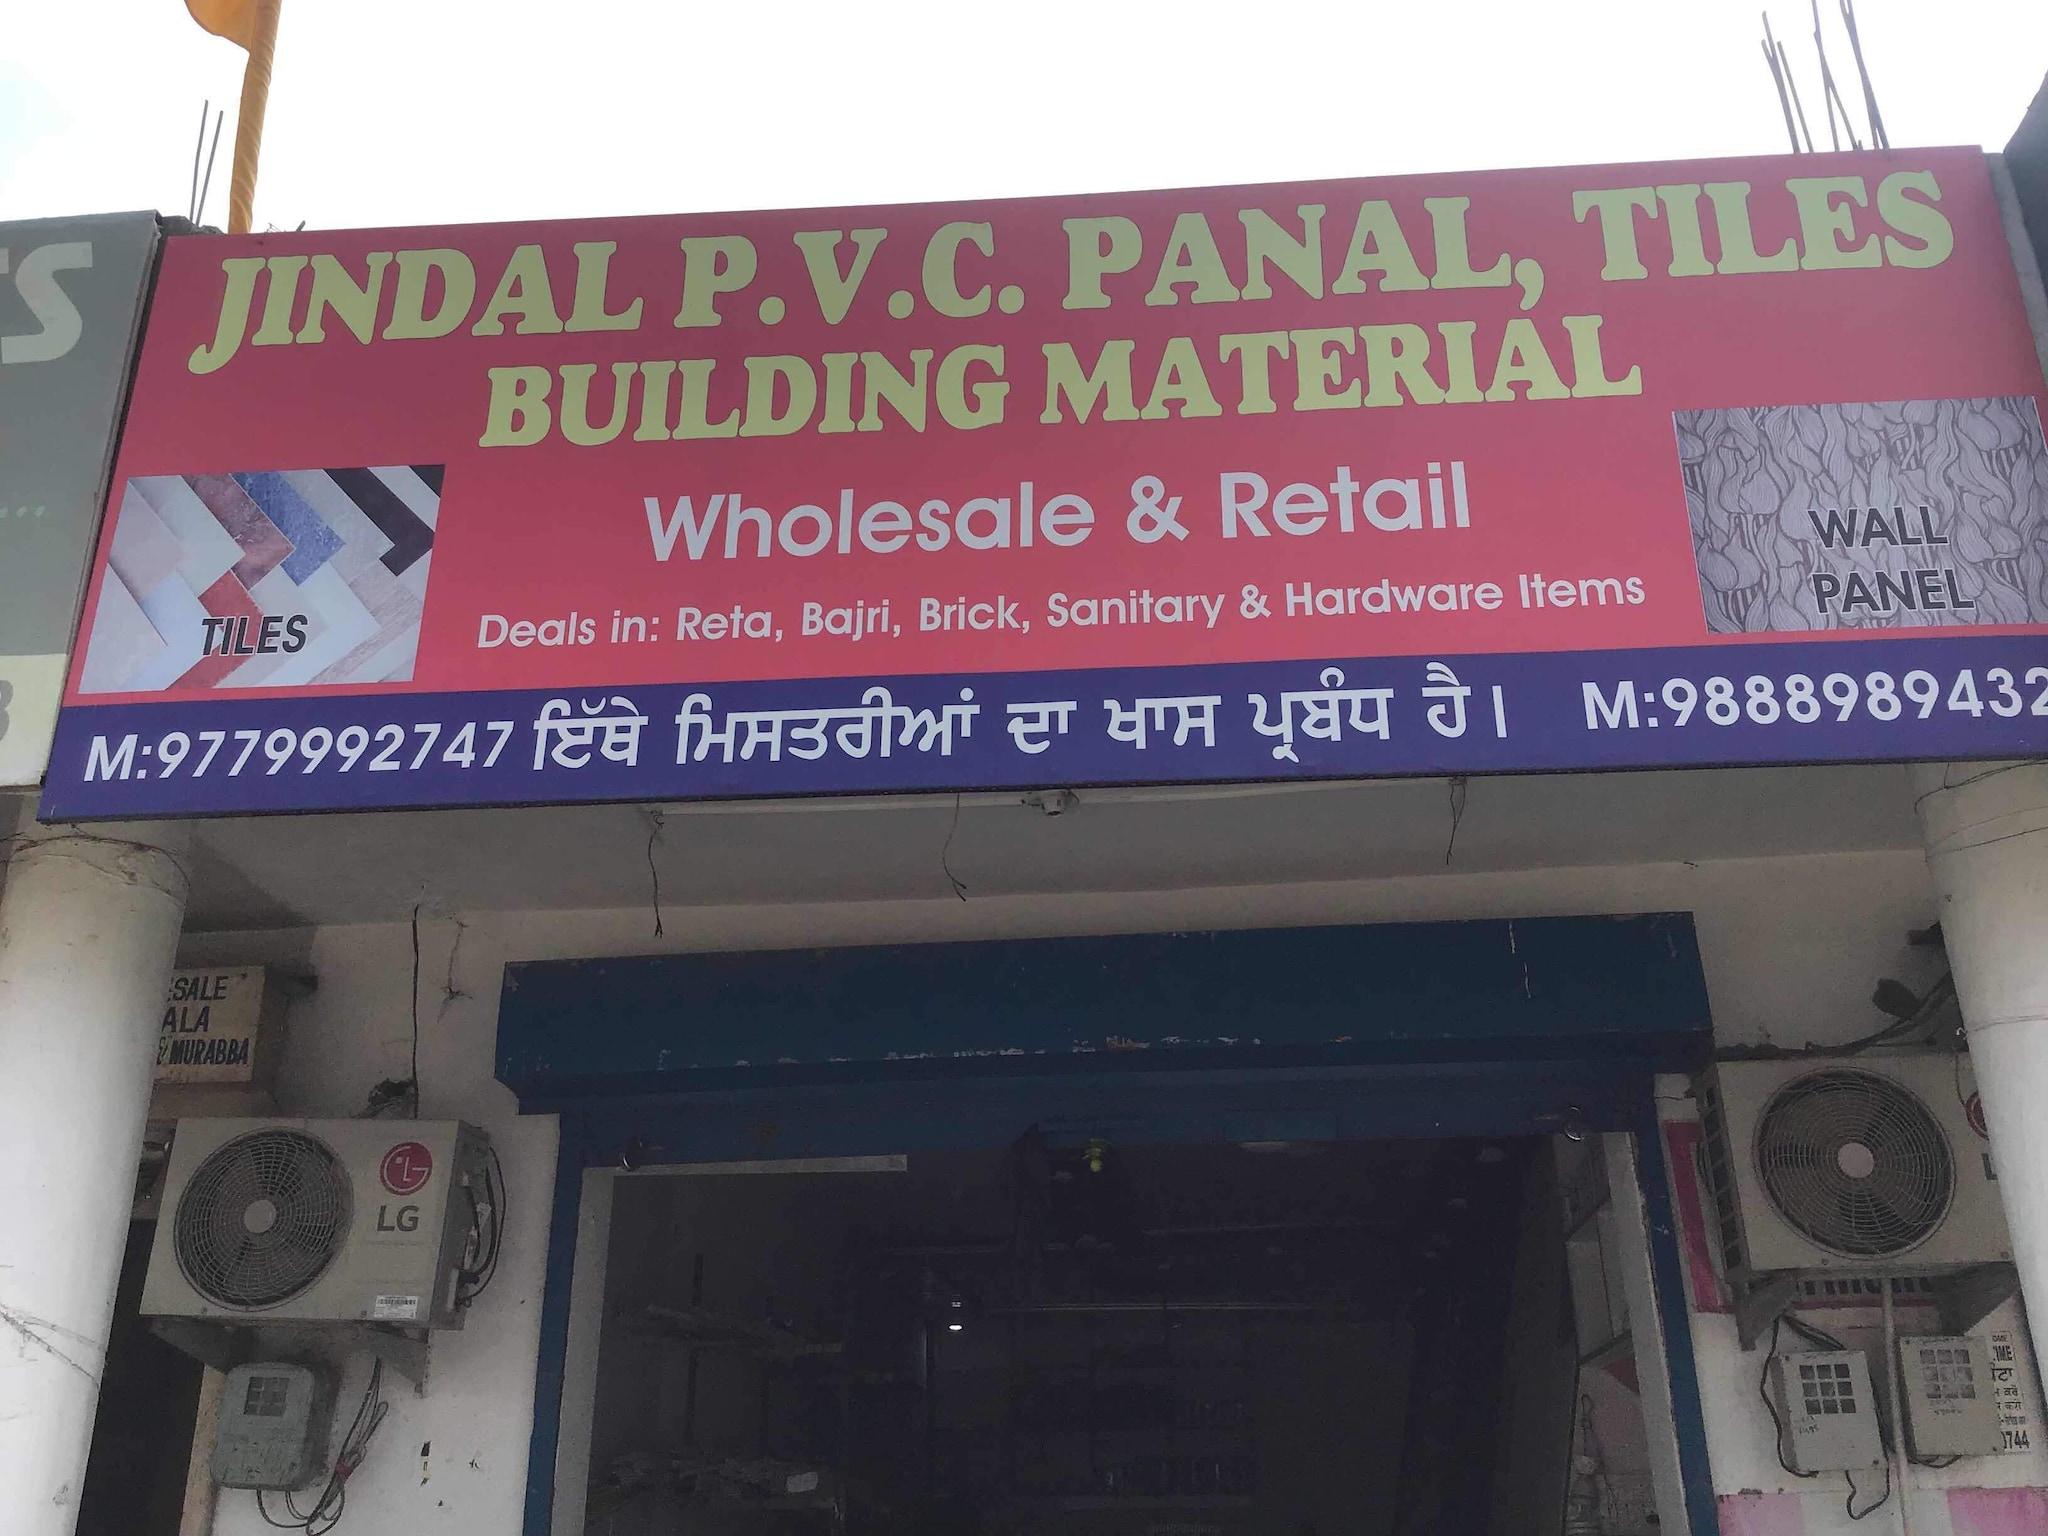 Top 30 PVC Wall Panel Wholesalers in Zirakpur HO - Best PVC Wall